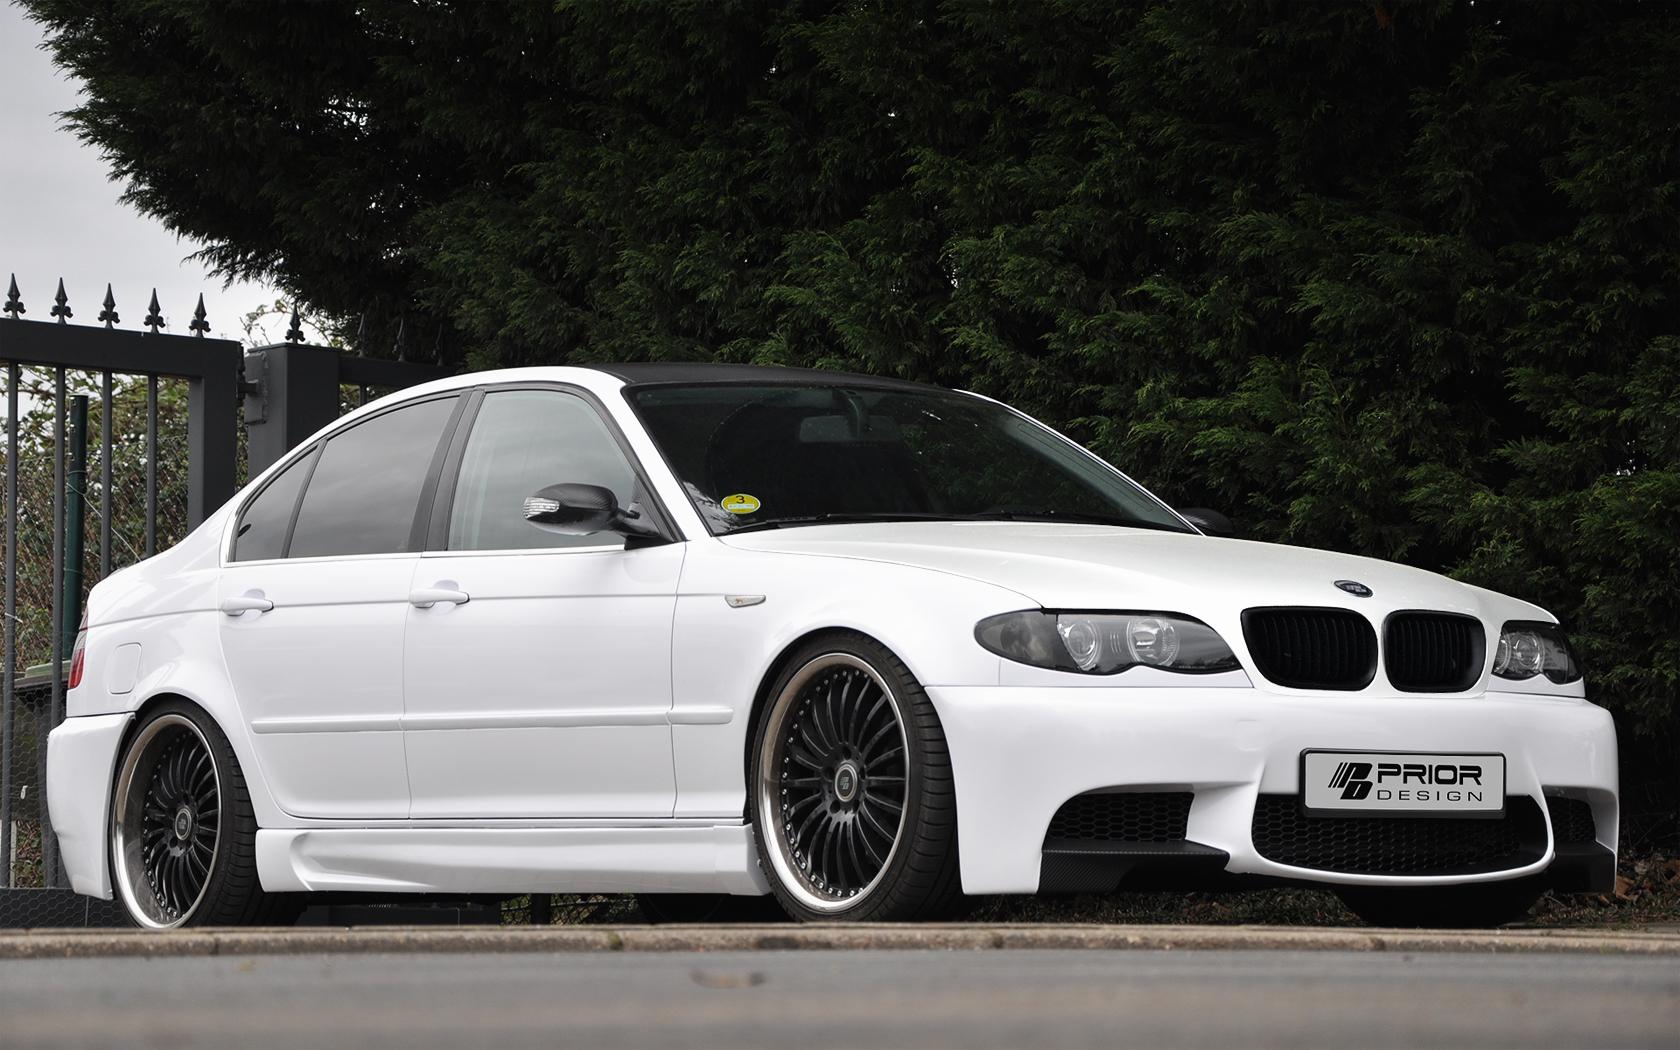 Prior design 39 s kit brings bmw e90 m3 bumpers to e46 sedans autoevolution